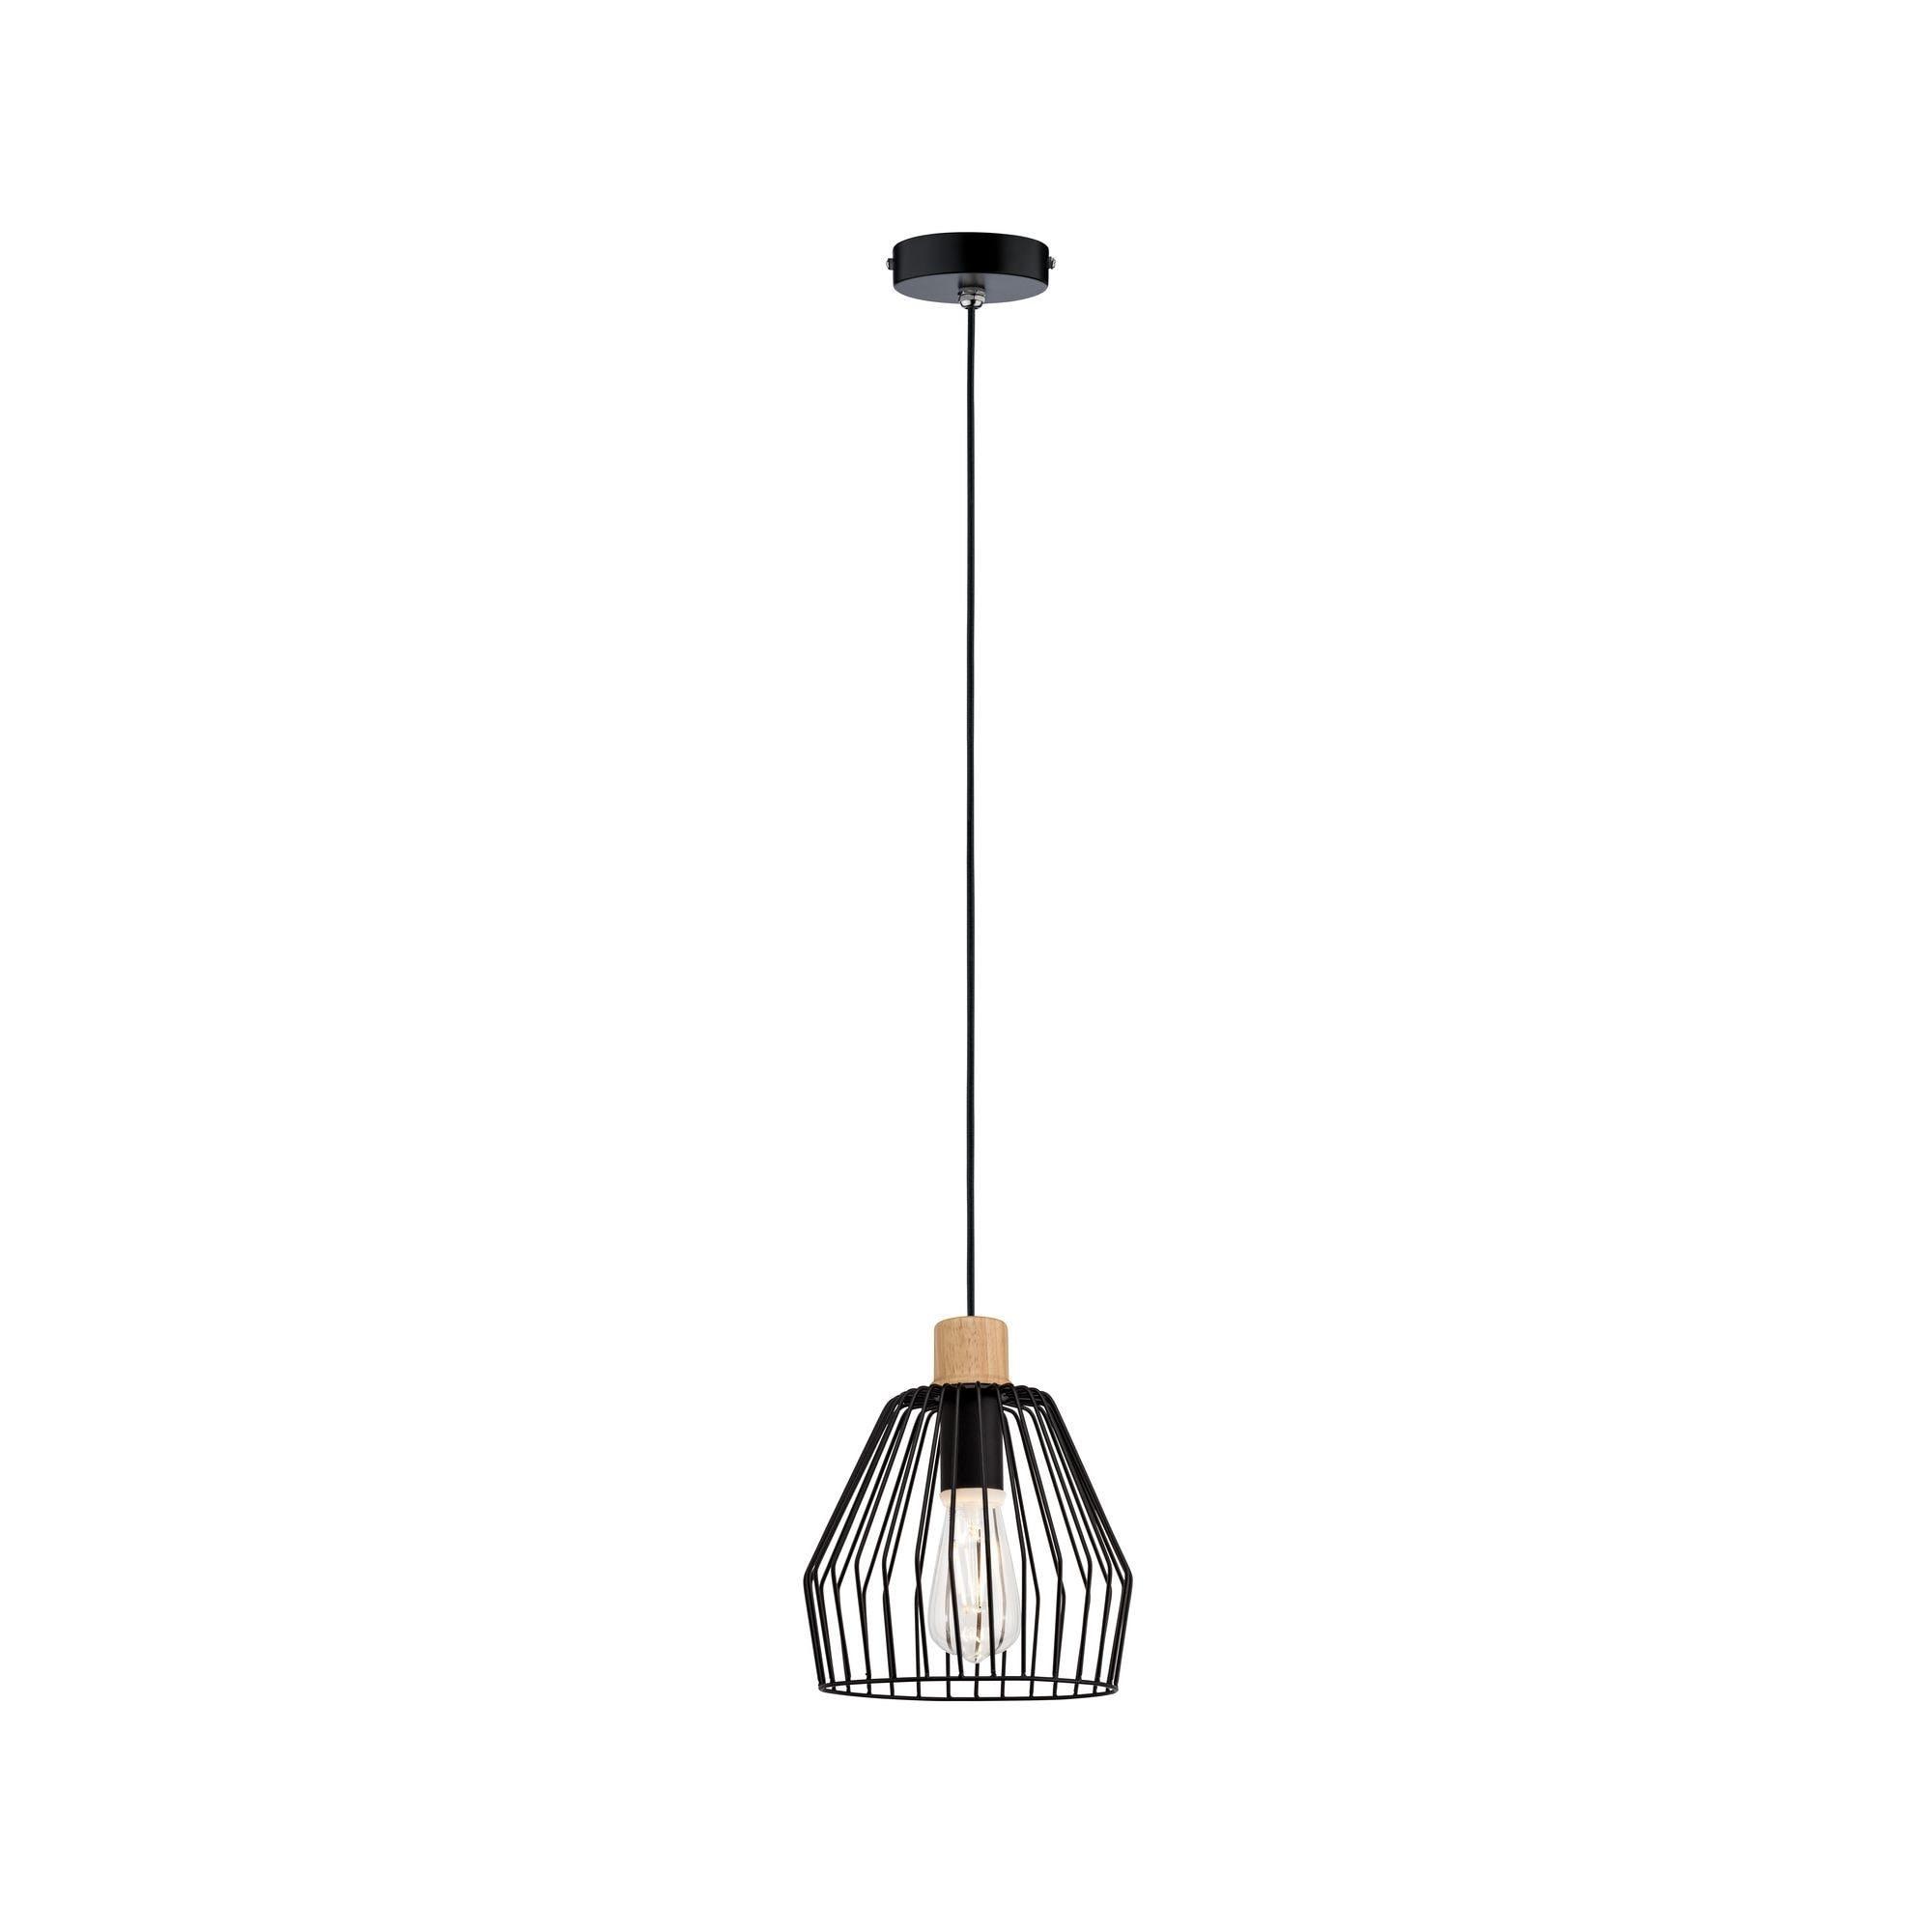 Paulmann LED Pendelleuchte Cameo Holz/Schwarz max. 20W E27, E27, 1 St.